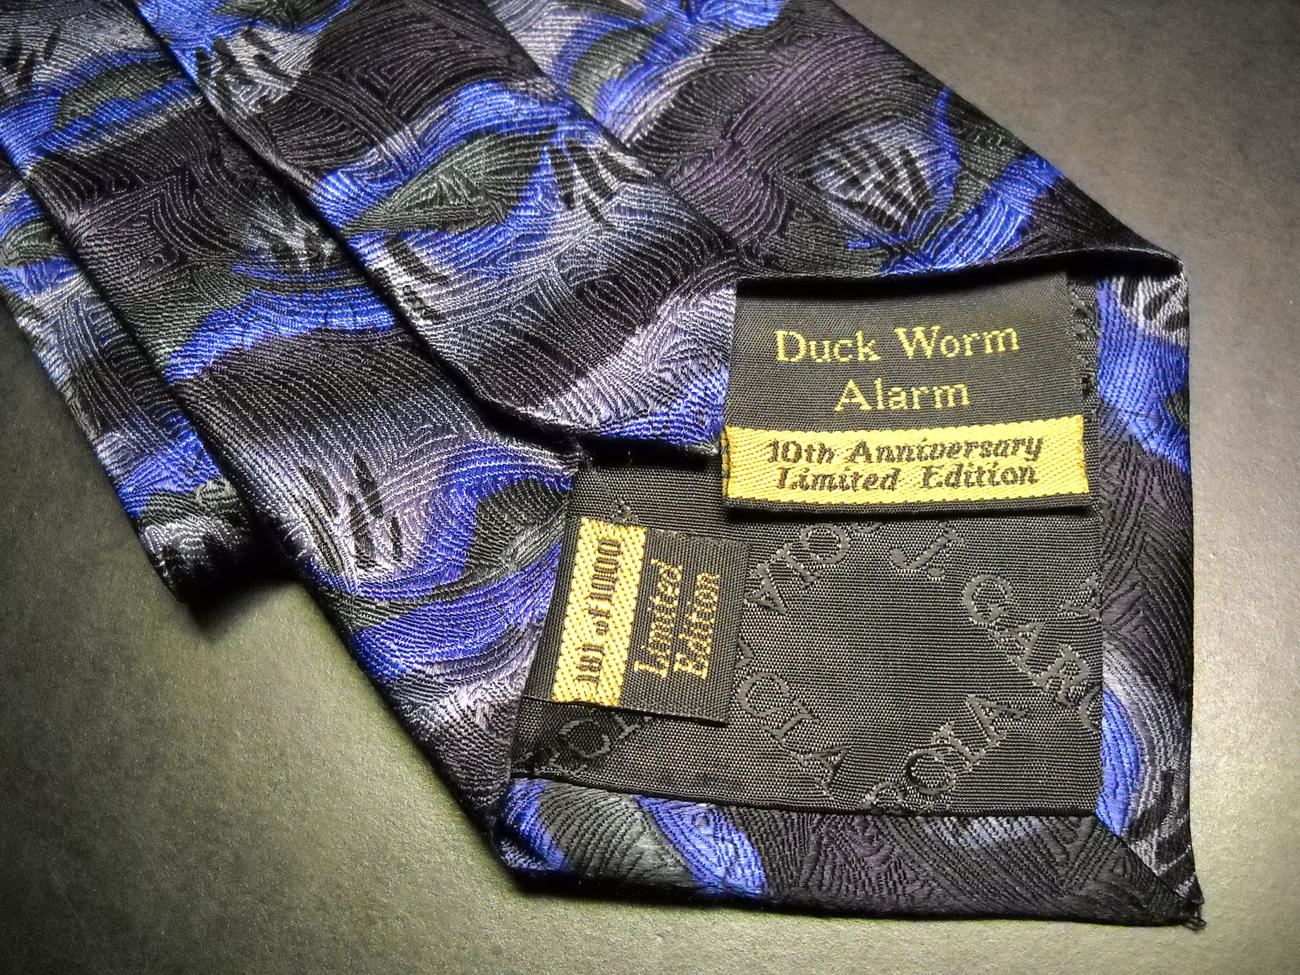 J Garcia Neck Tie Duck Worm Alarm 10th Anniversary Blues and Greys